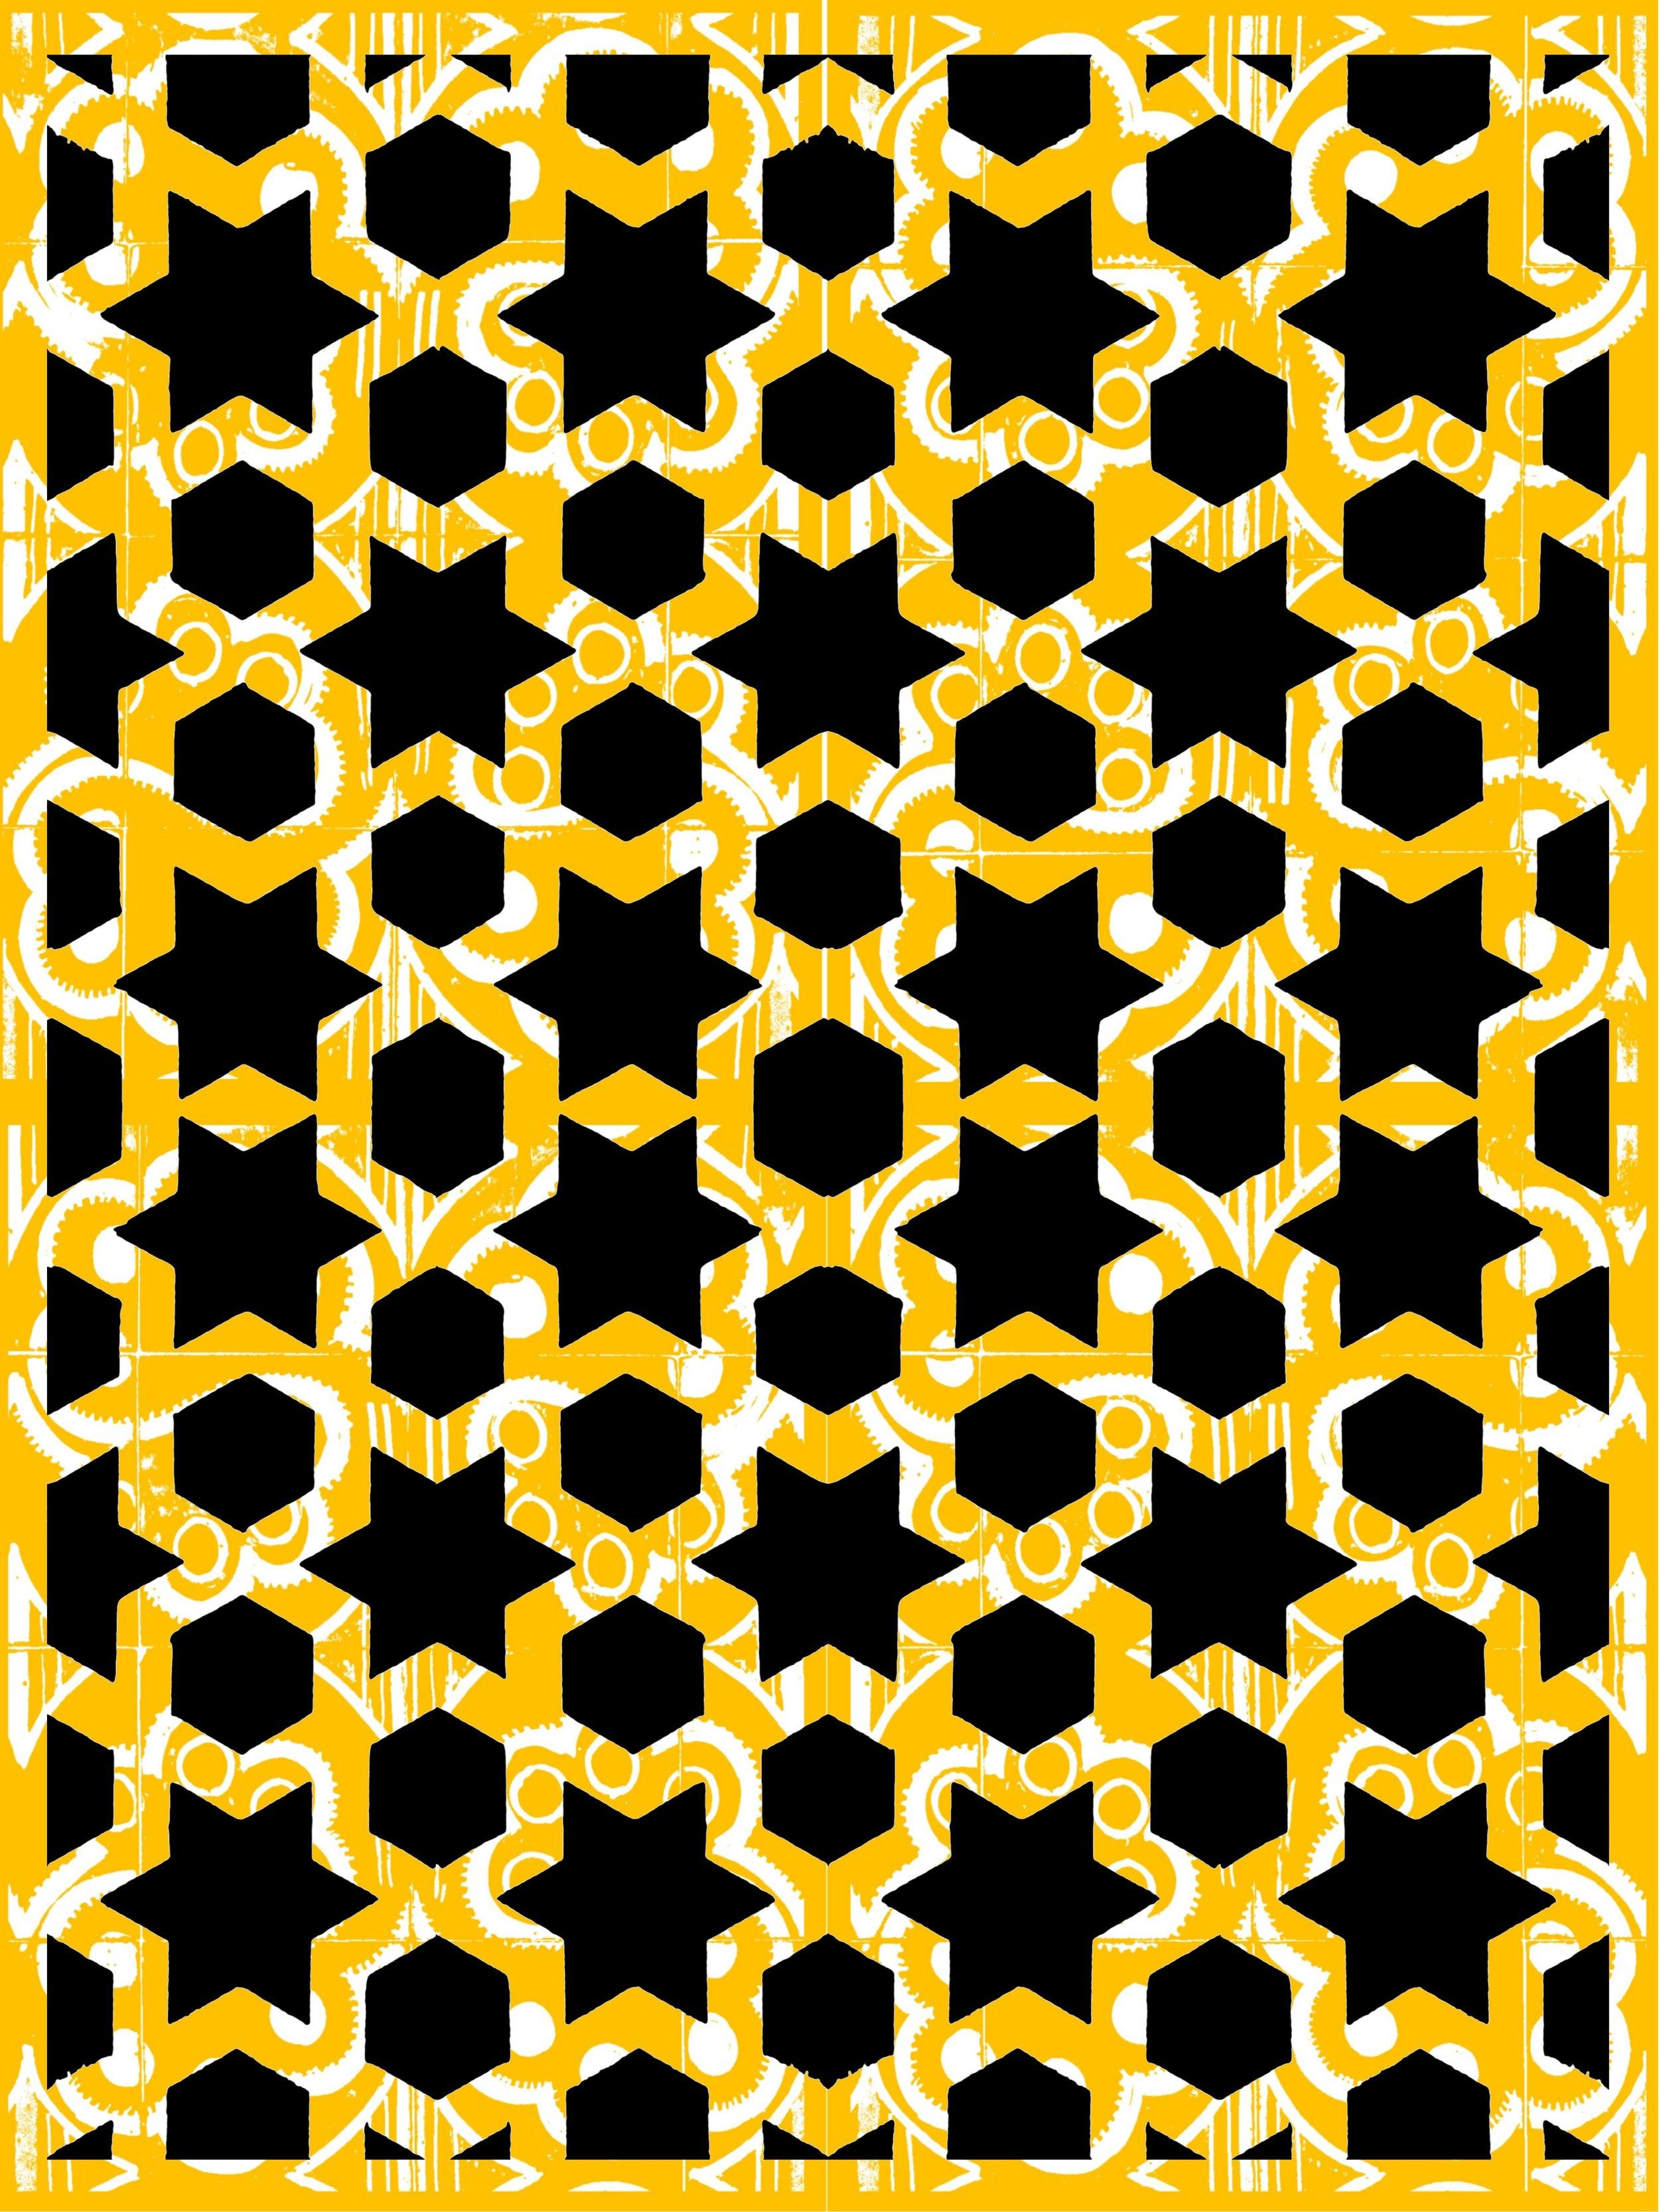 Islamiic star and palsey pattern.jpg